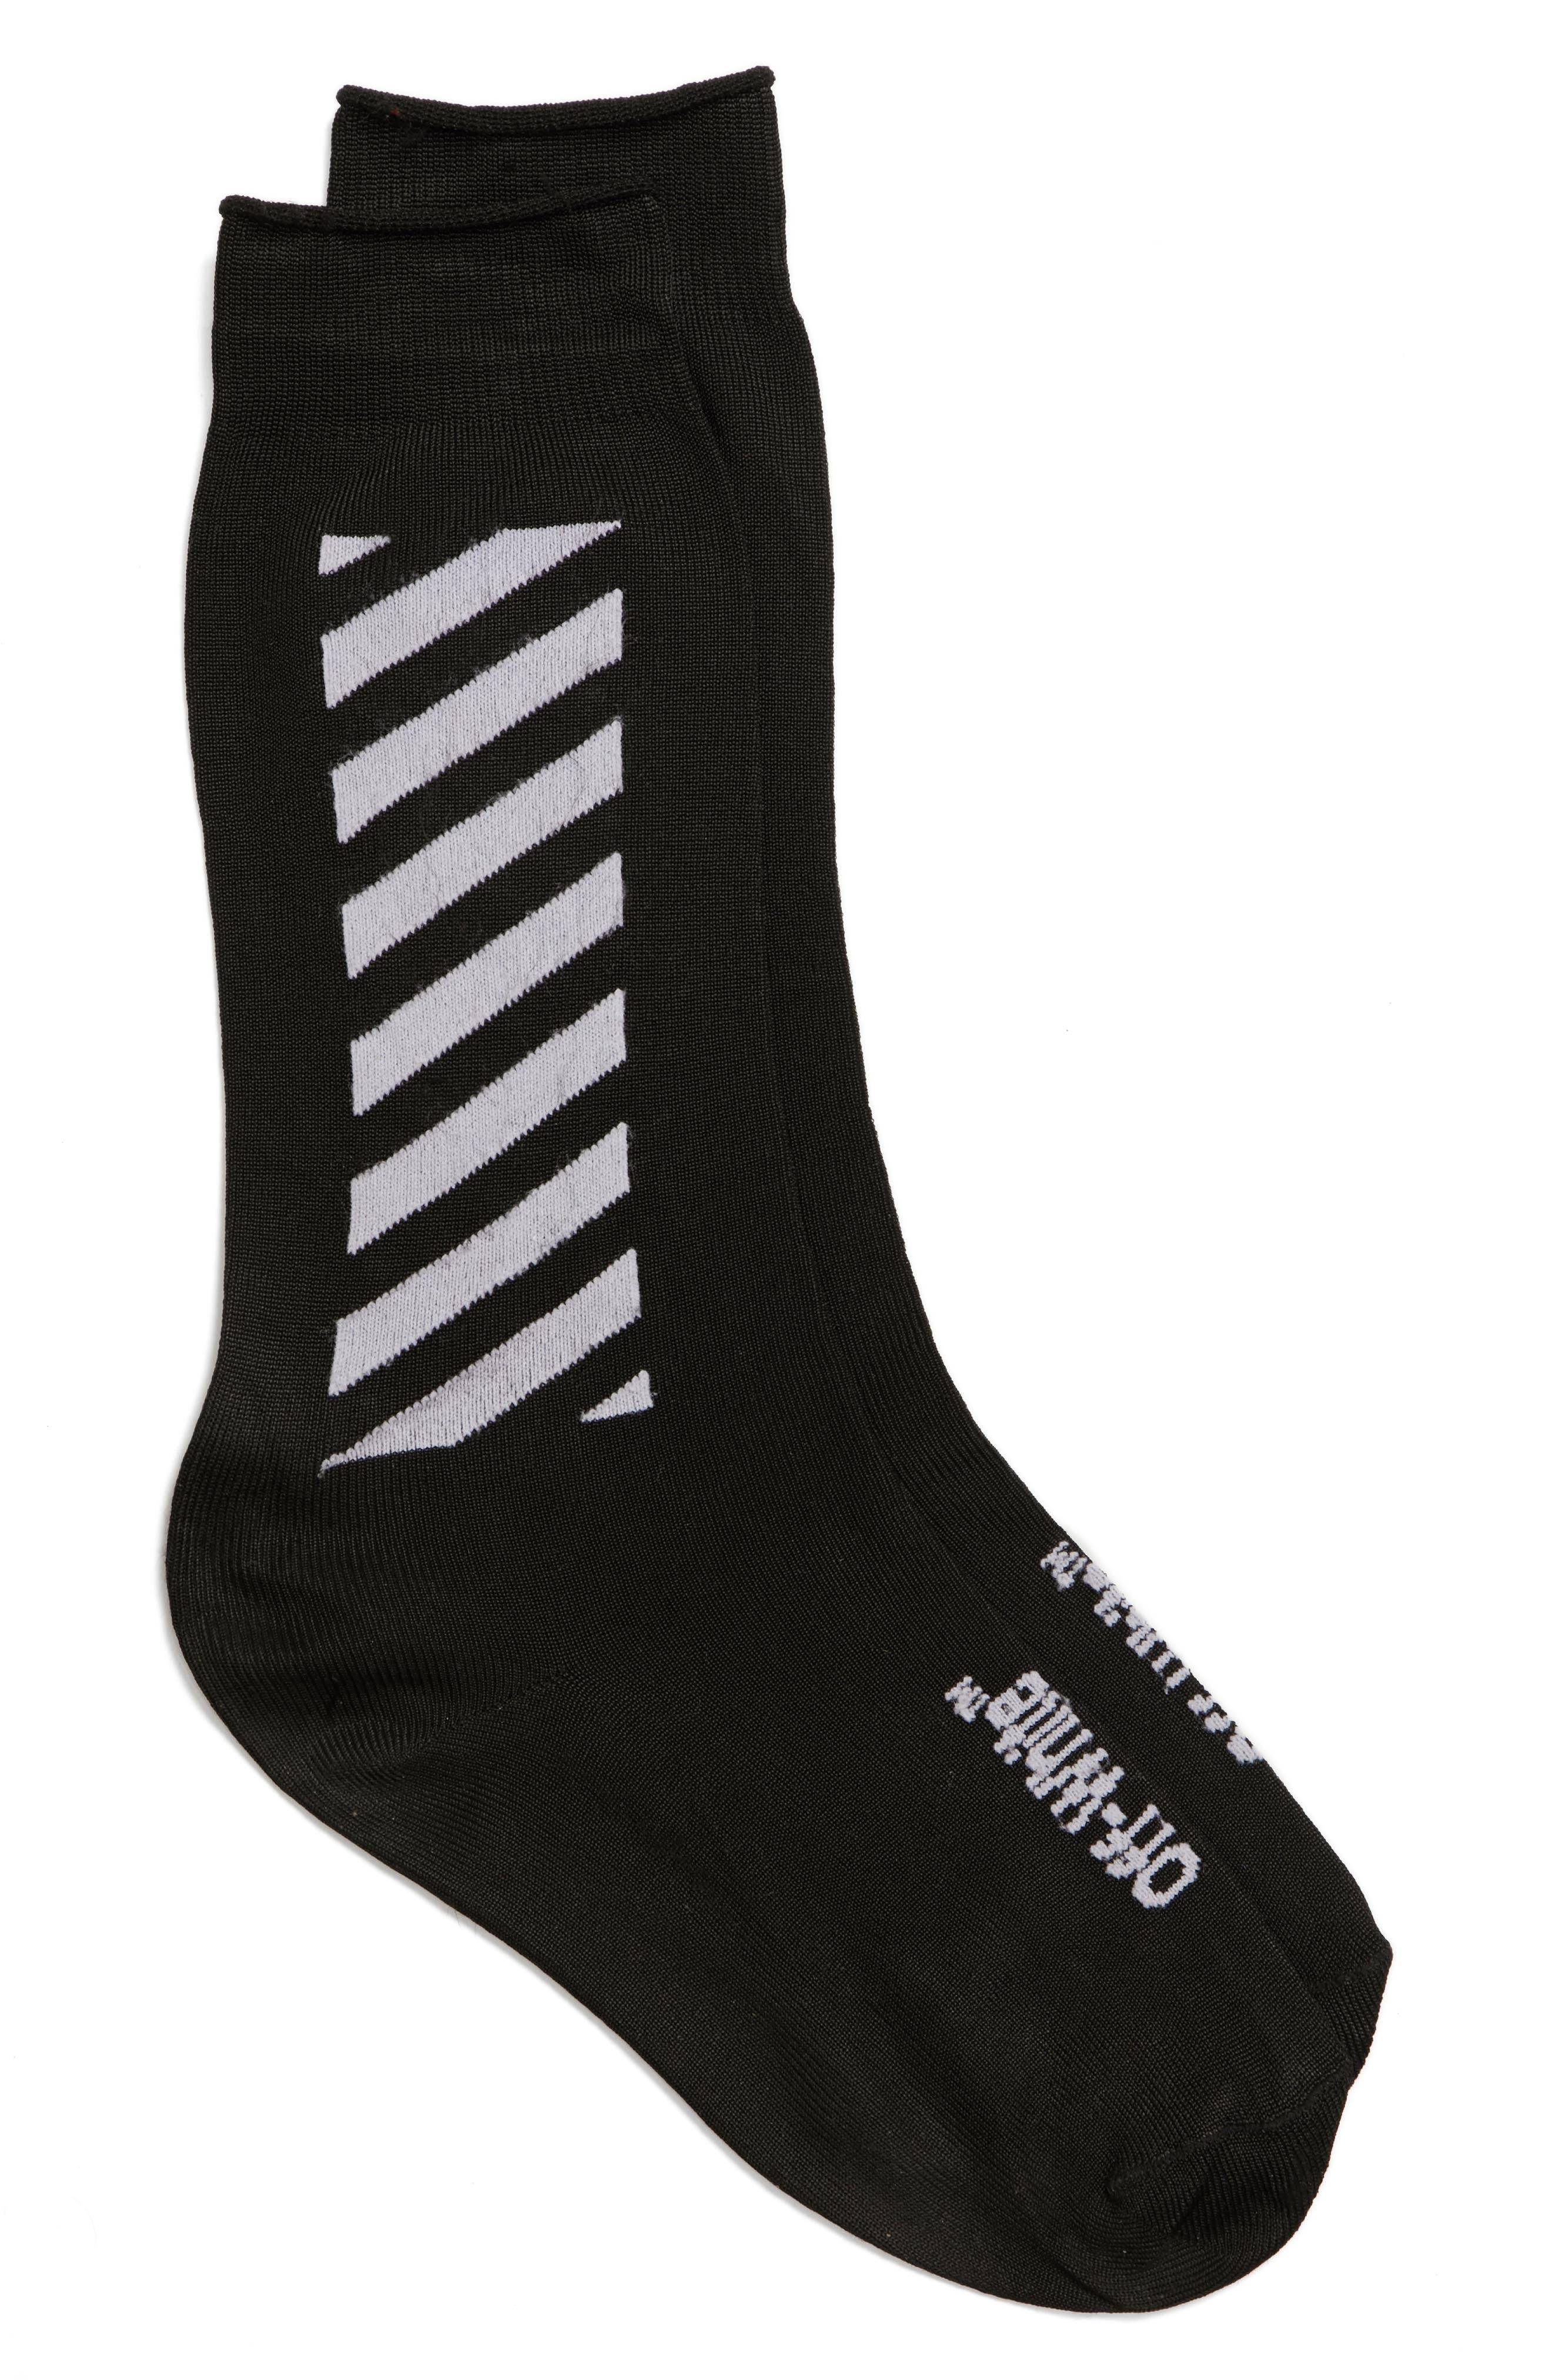 Diagonal Long Socks,                             Main thumbnail 1, color,                             Black/ White